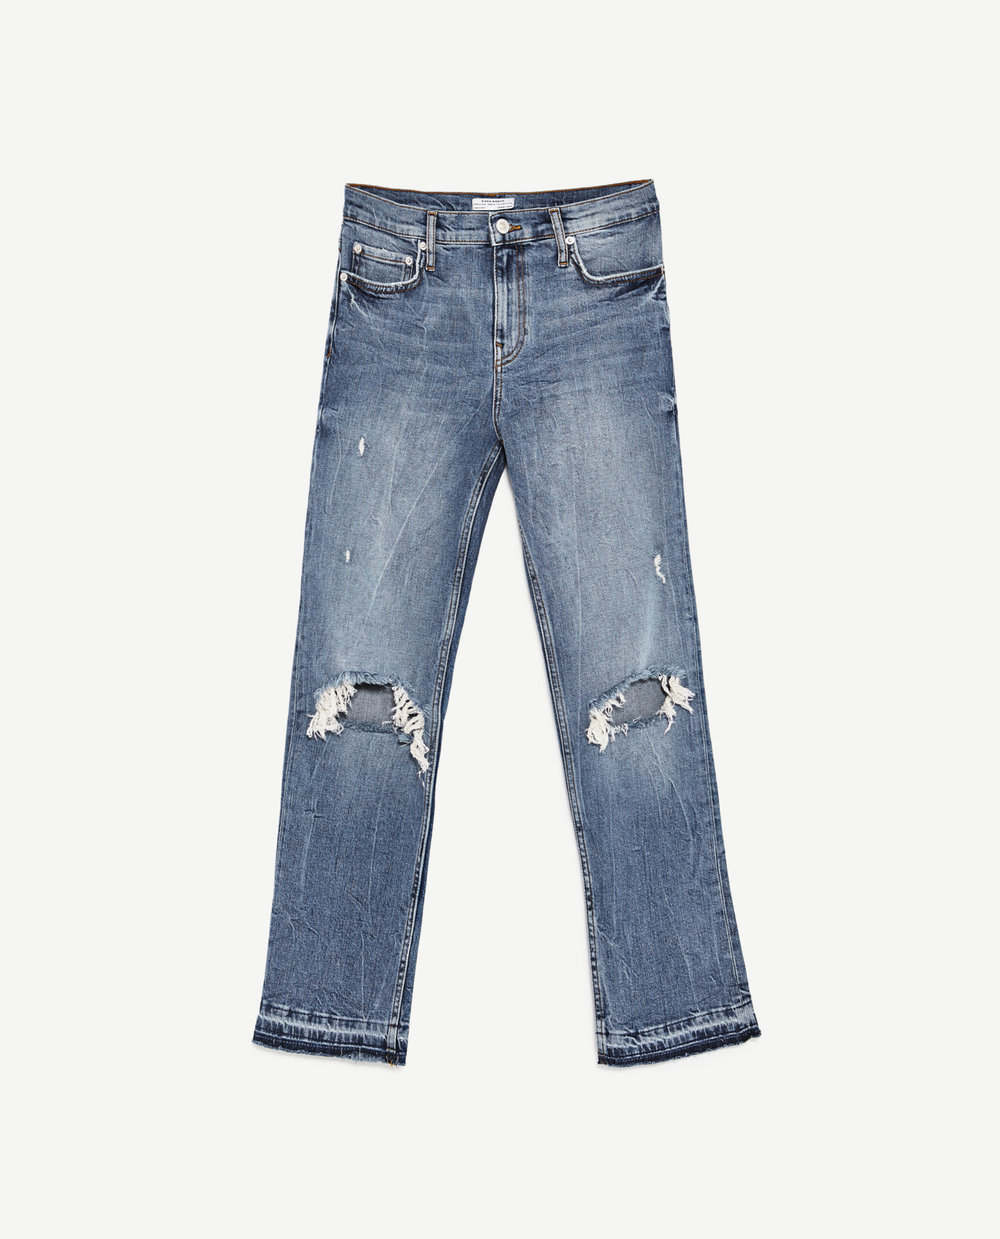 dis jeans.jpg